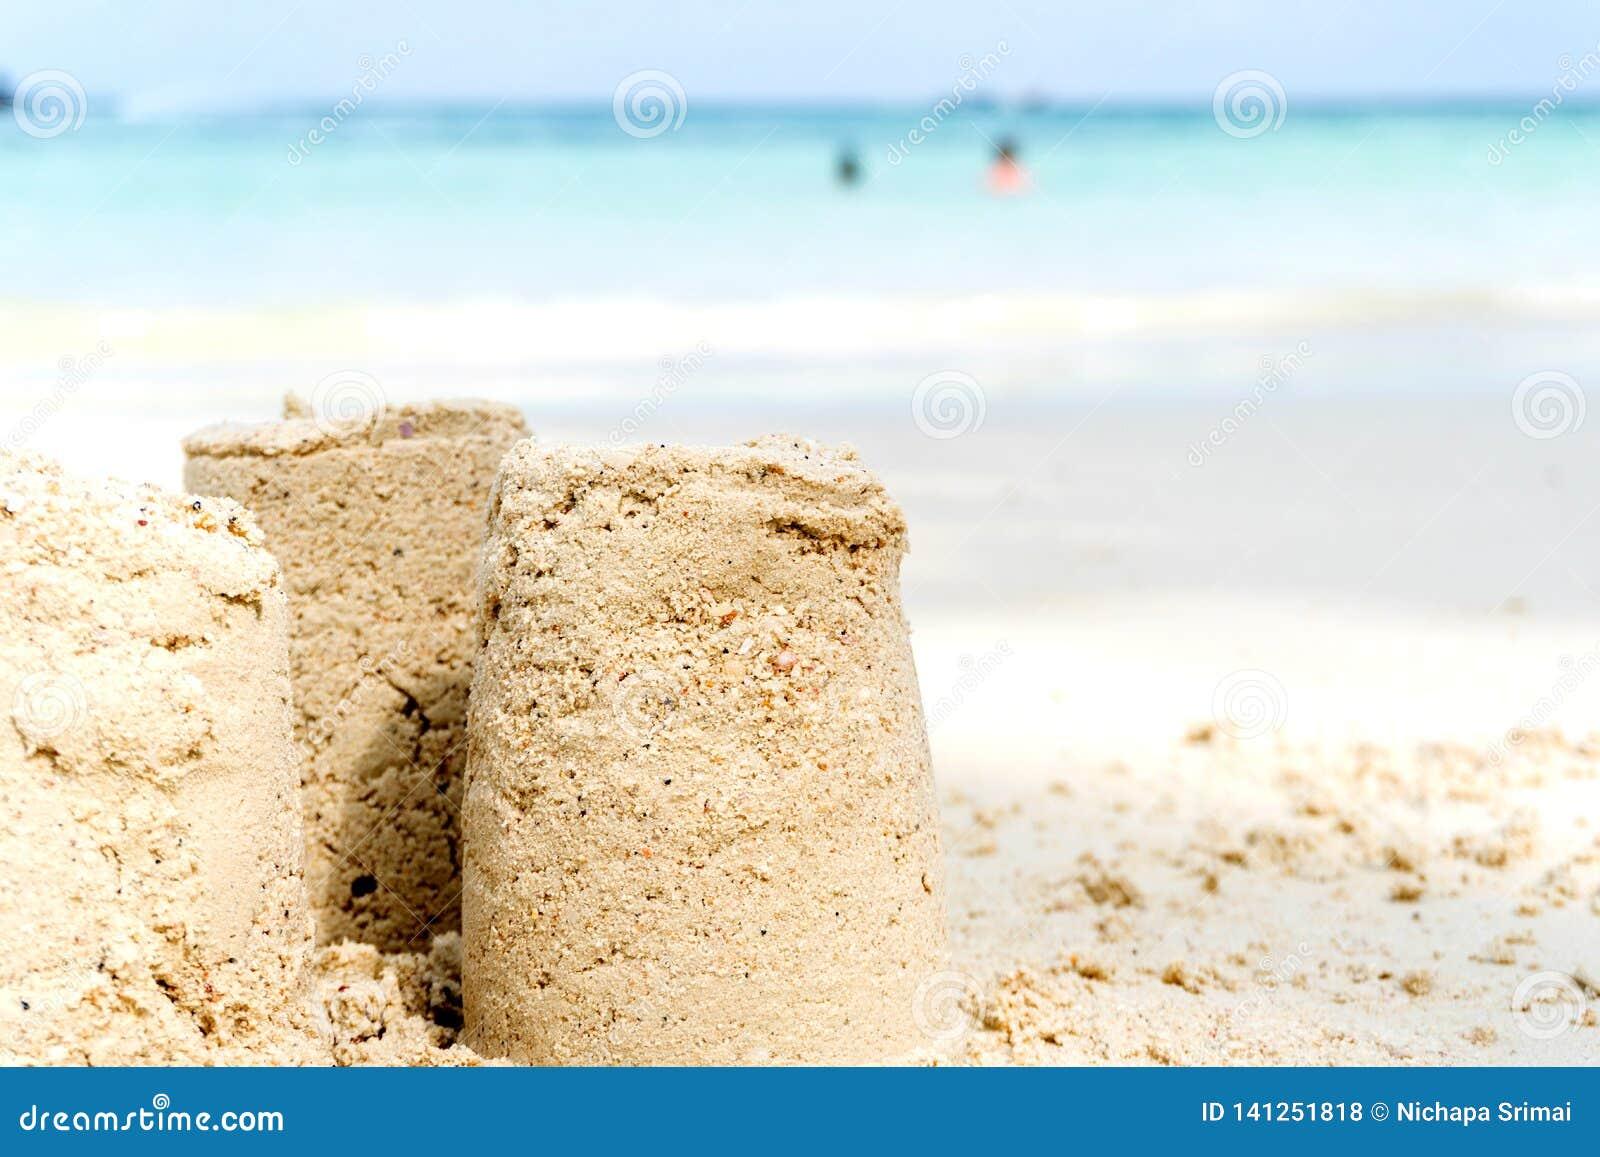 Sandburgsommer auf Strand